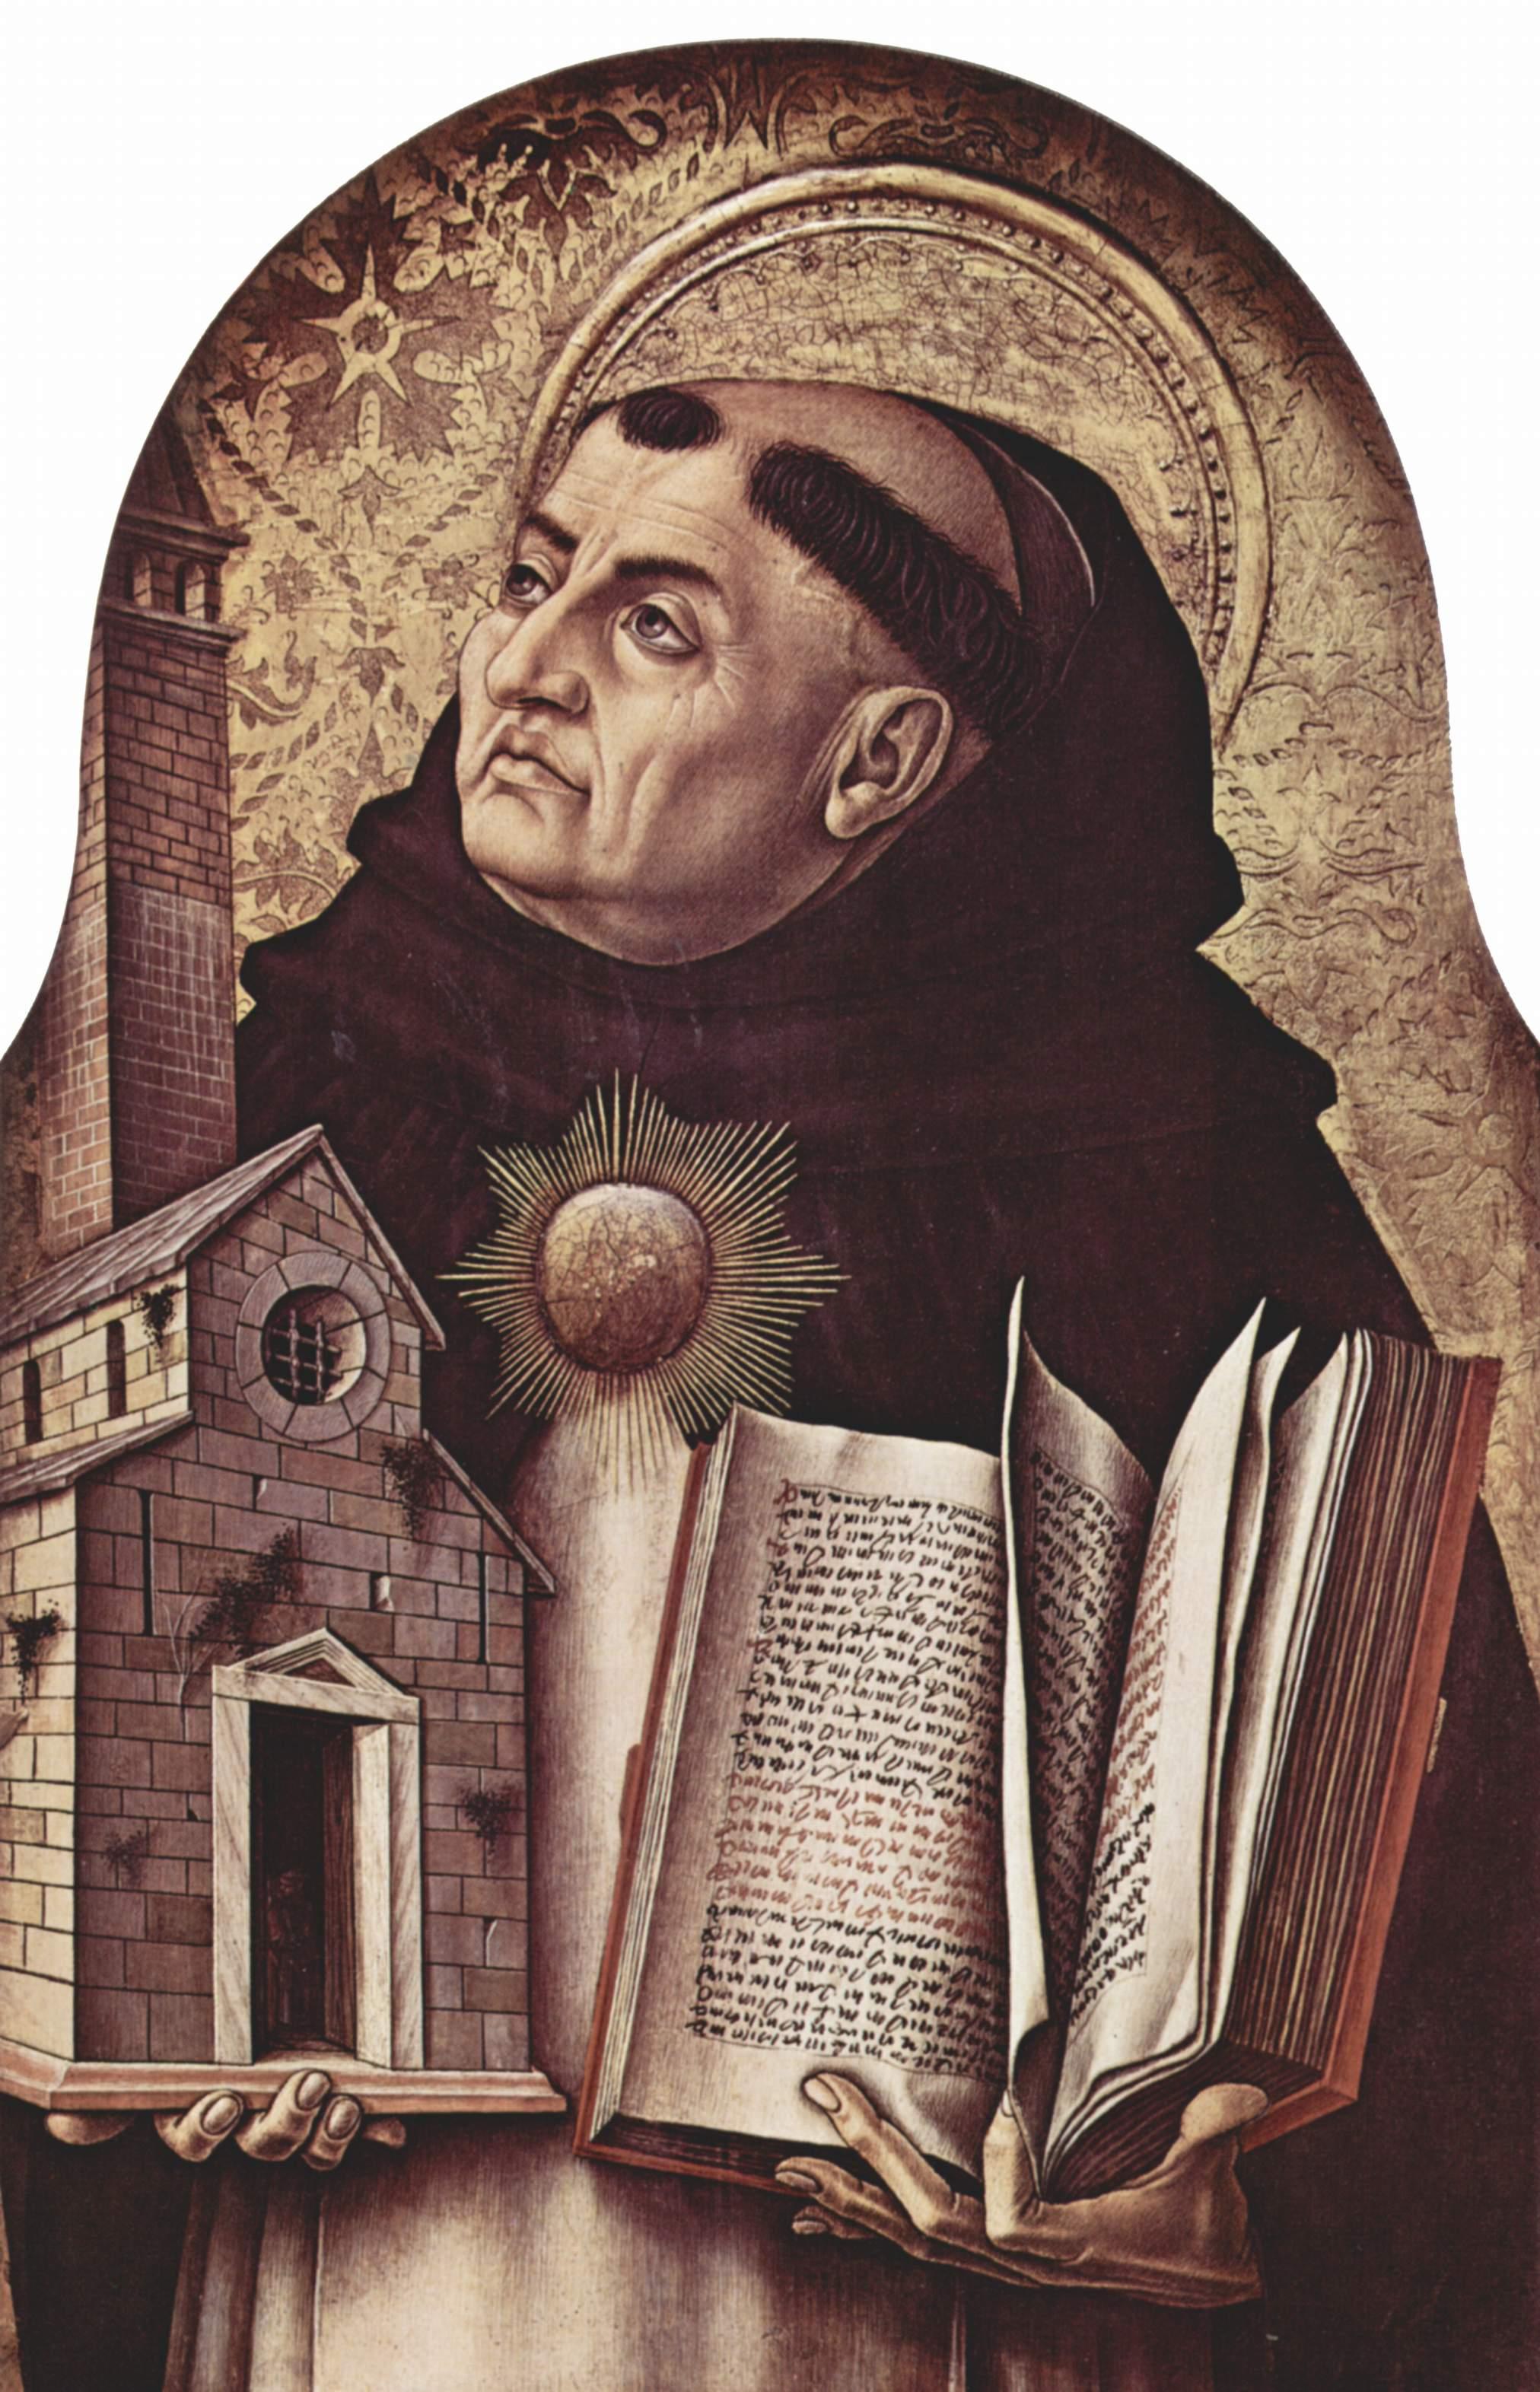 Carlo Crivelli, Der hl. Thomas von Aquin, 1476, National Gallery, London